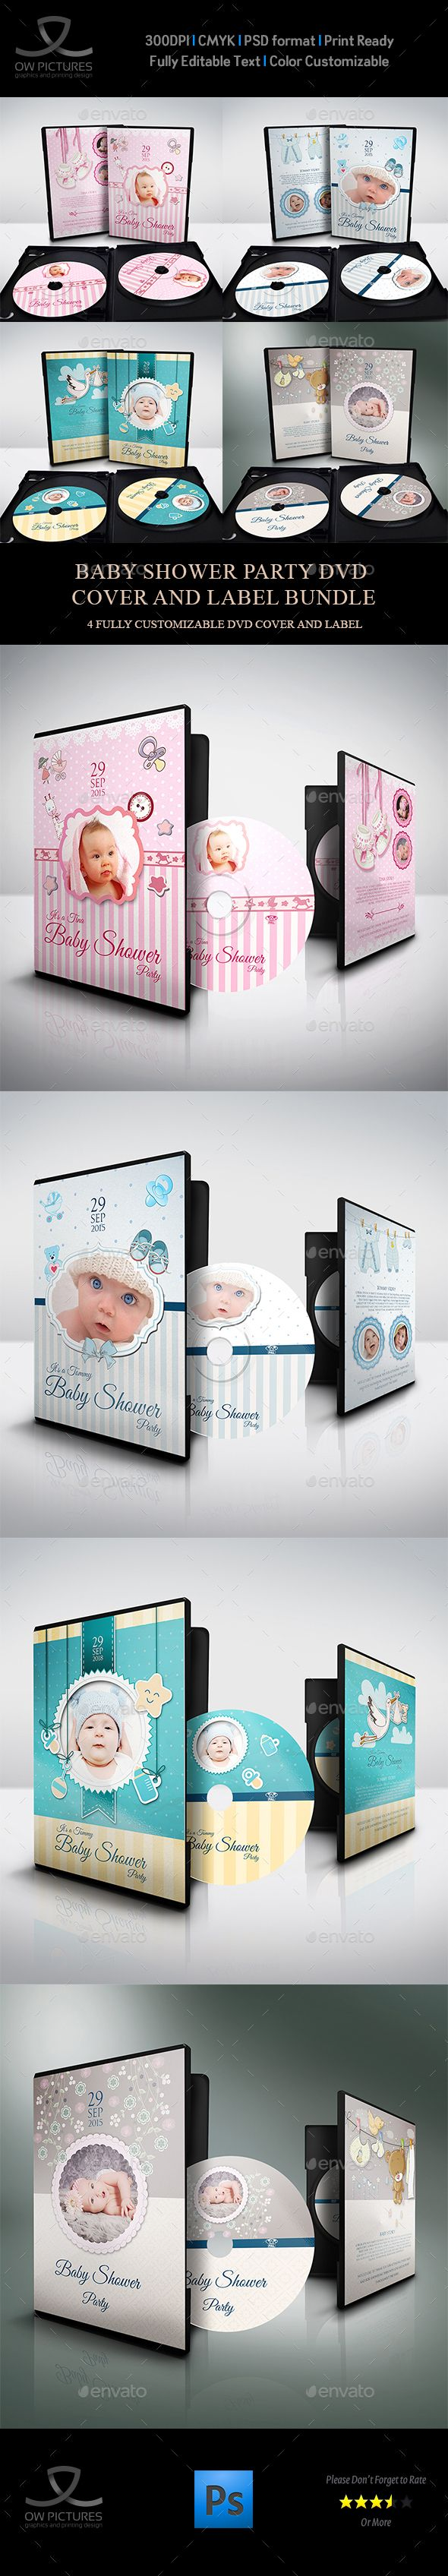 Baby Shower Party DVD Bundle Vol.1 - #CD & DVD #Artwork Print #Templates Download here: https://graphicriver.net/item/baby-shower-party-dvd-bundle-vol1/19491714?ref=alena994